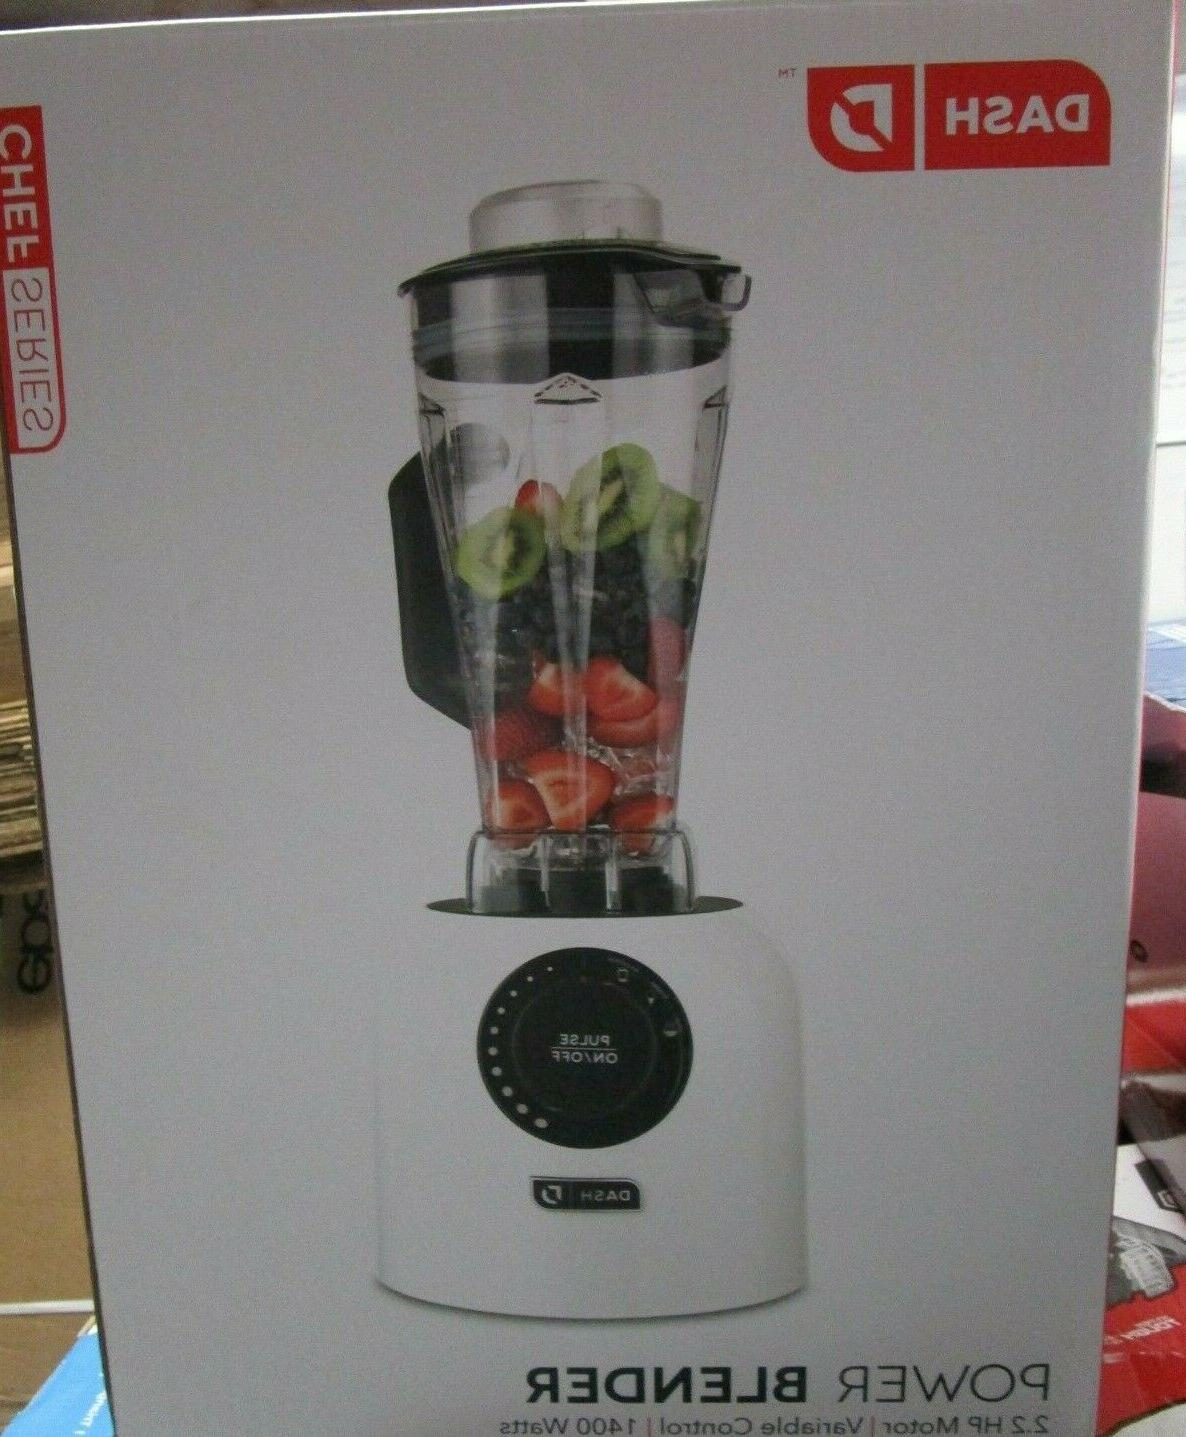 dpb300wh chef series power blender